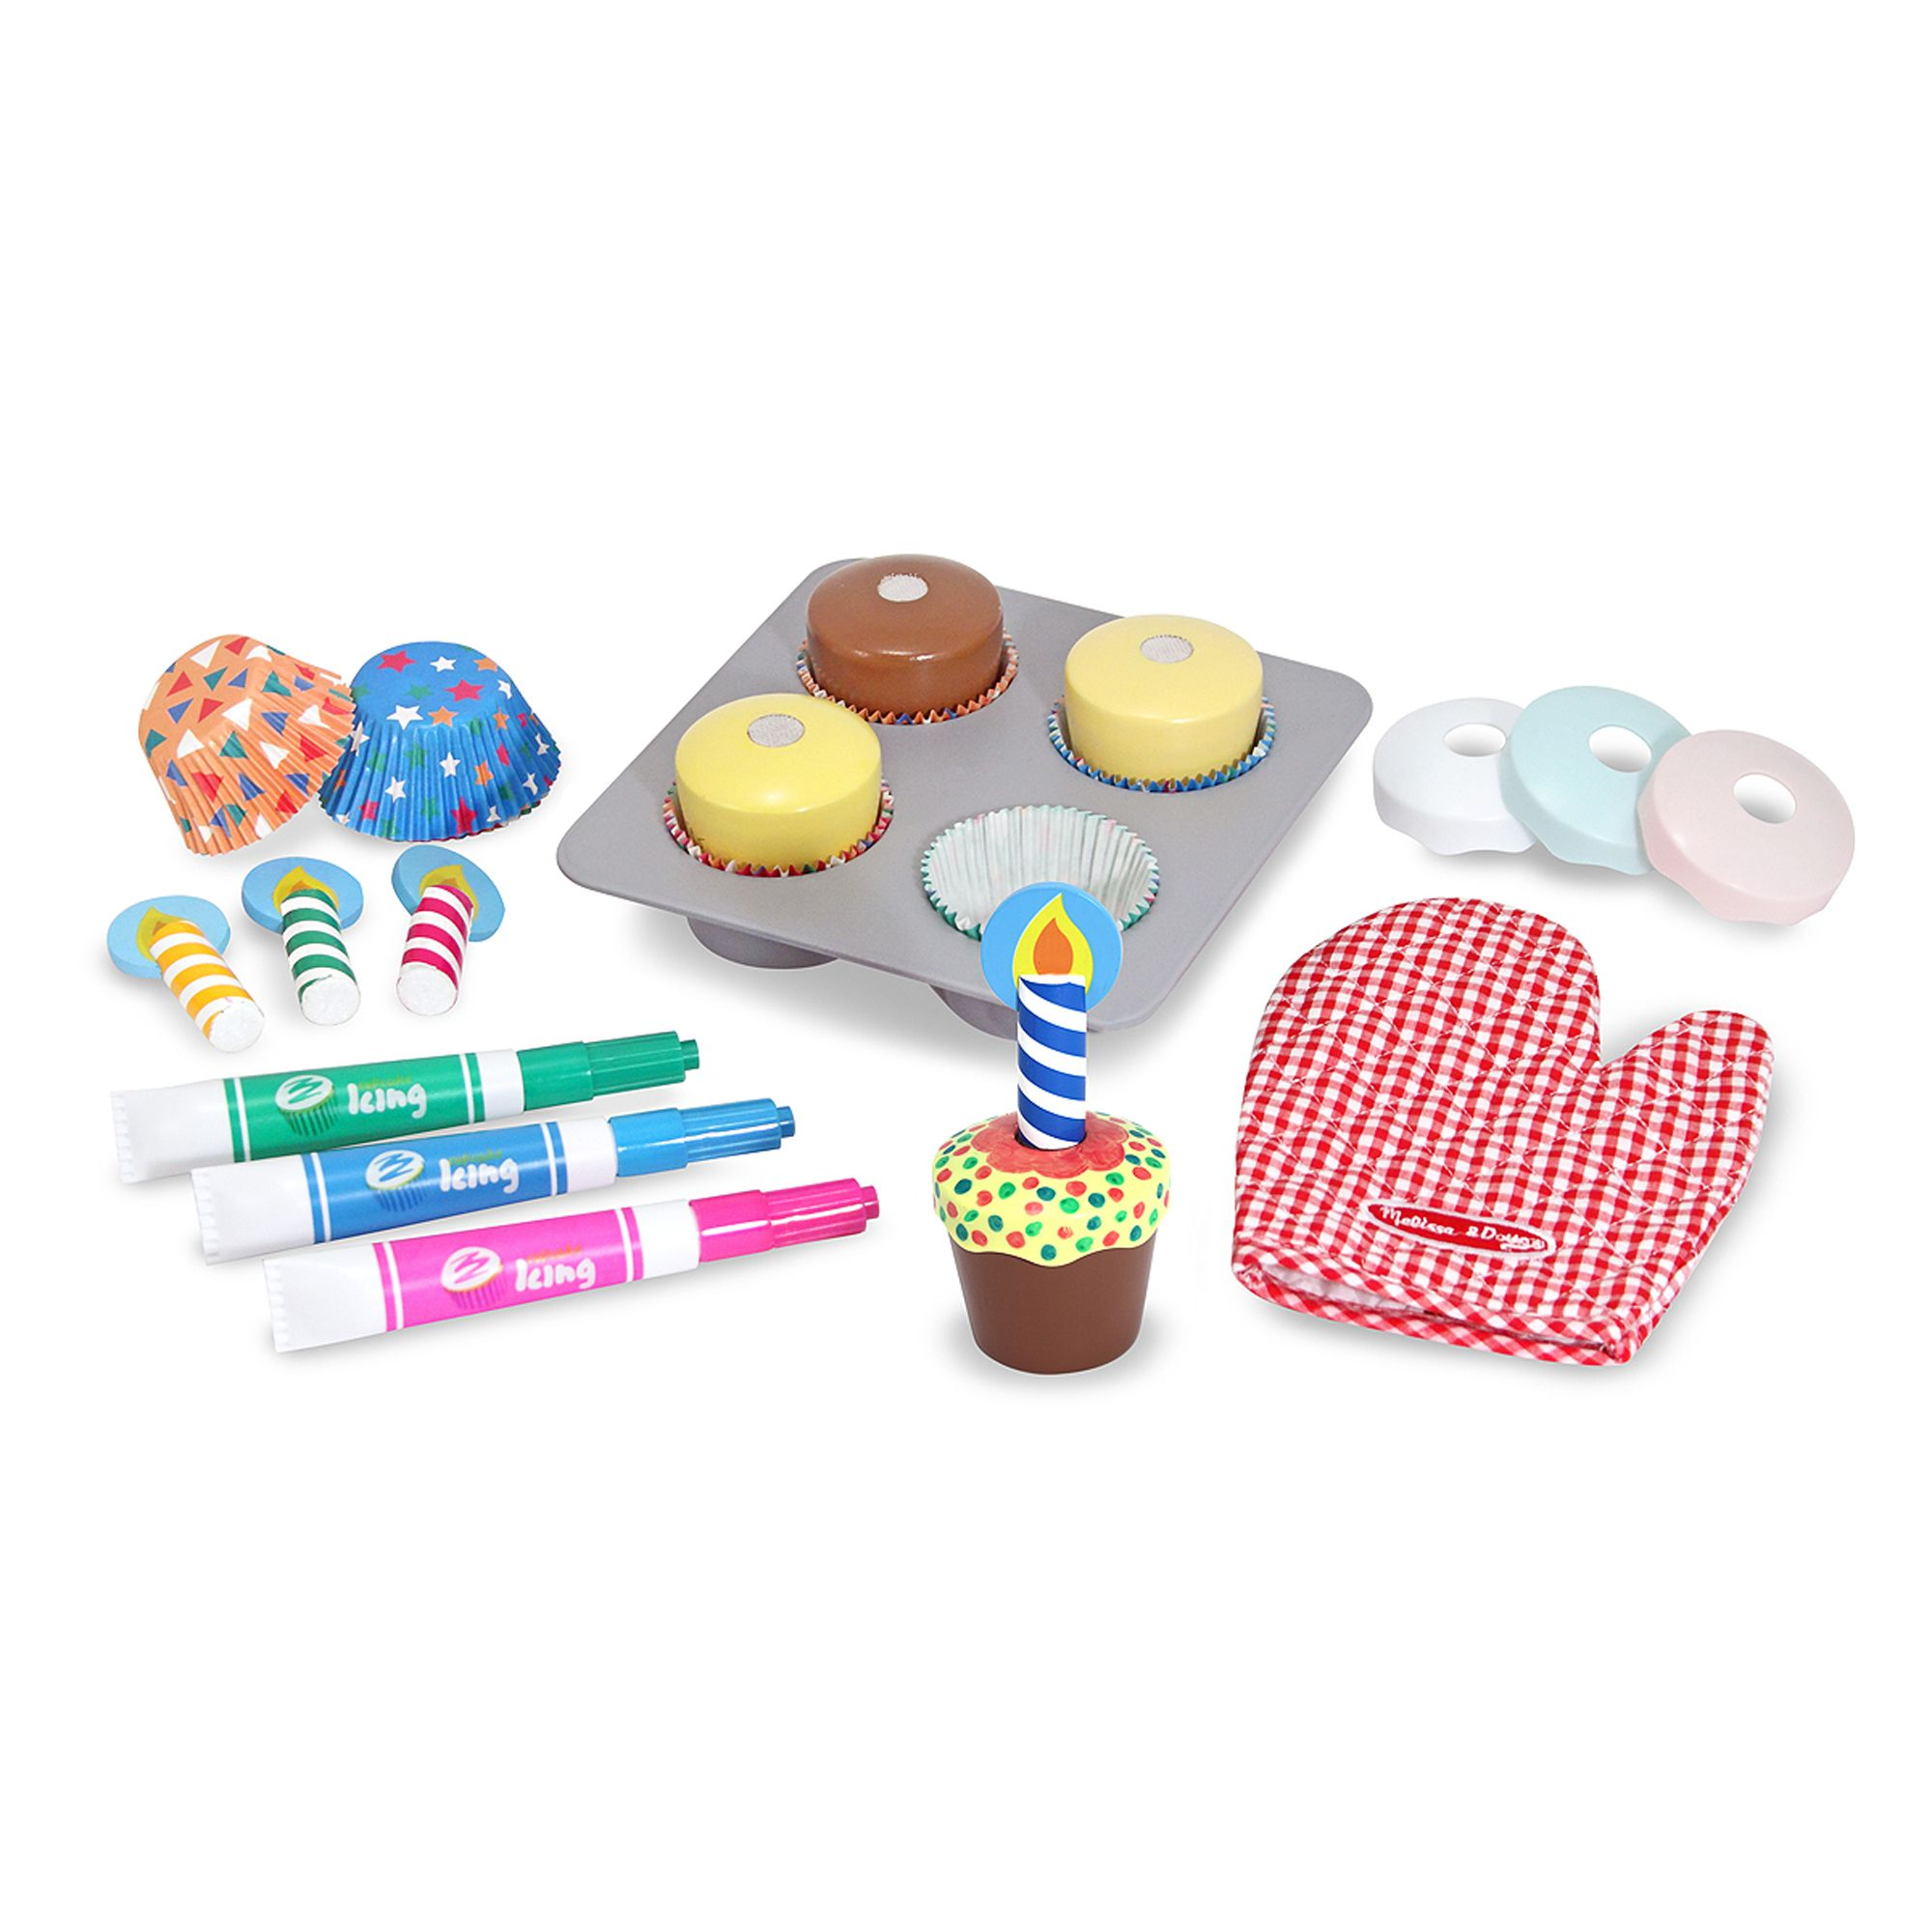 Melissa & Doug - Bake & Decorate Cupcake Set (14019)